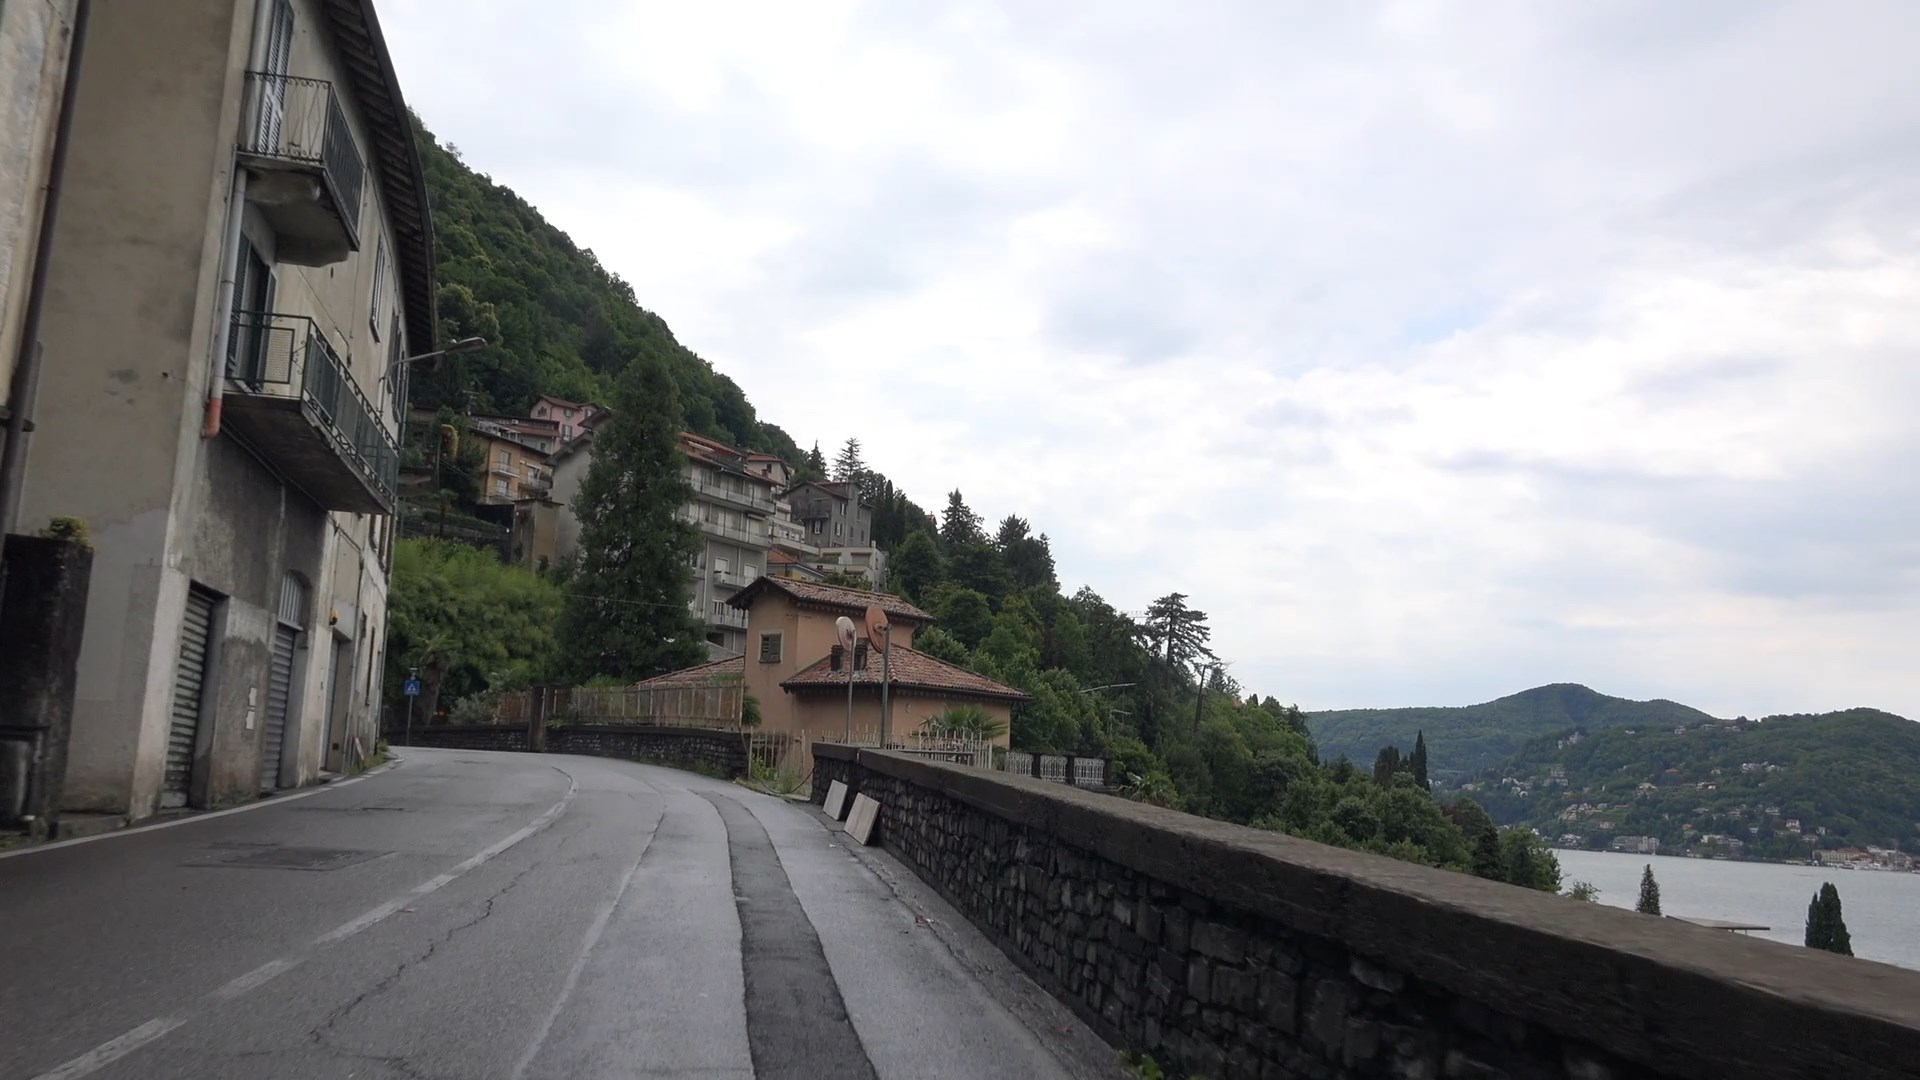 Part 2 of Lake Como Grand Tour. Gallery Image 4